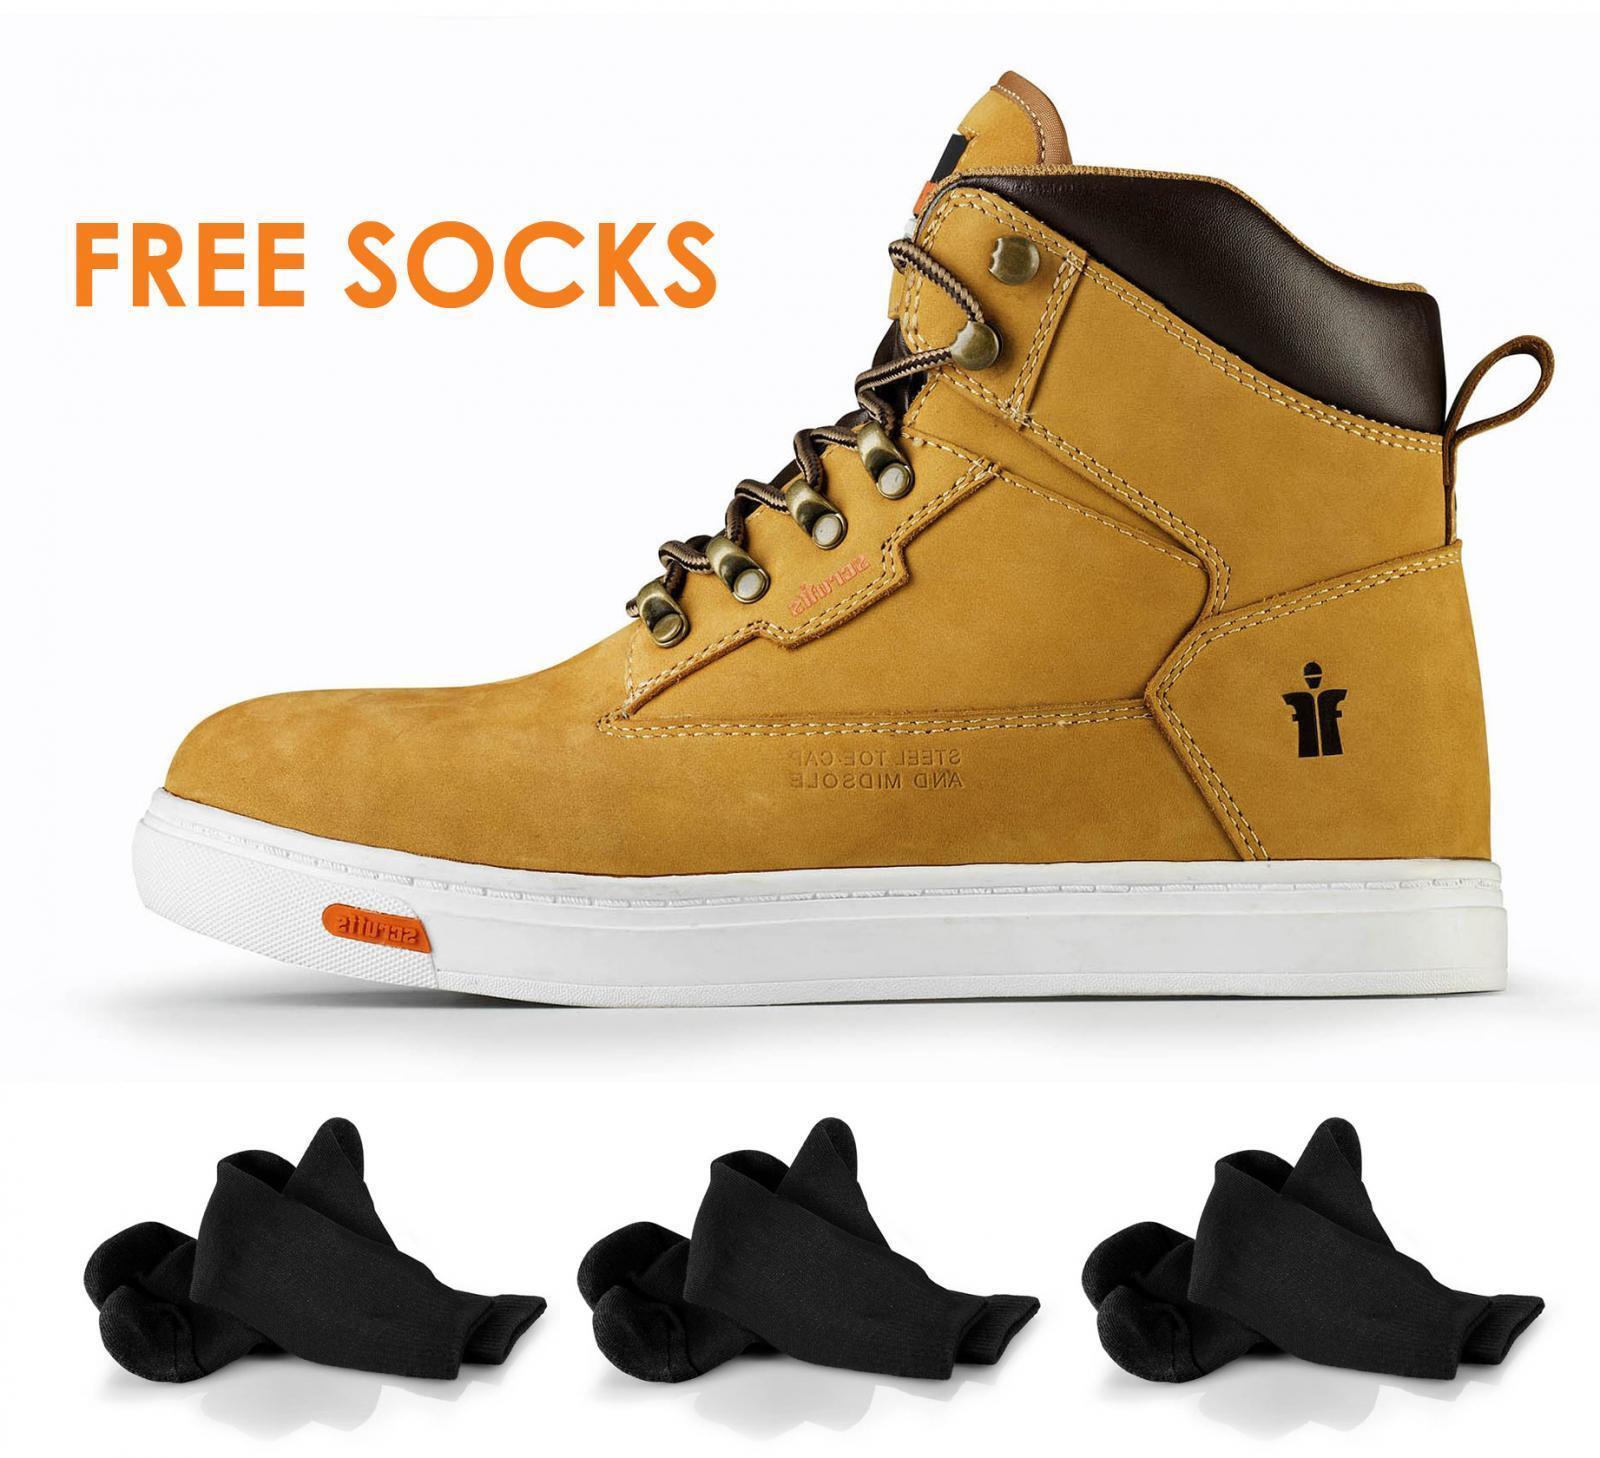 SCRUFFS TWISTER SPORT SAFETY WORK Stiefel SBP SRA HRO Rated STEEL TOE CAP + SOCKS